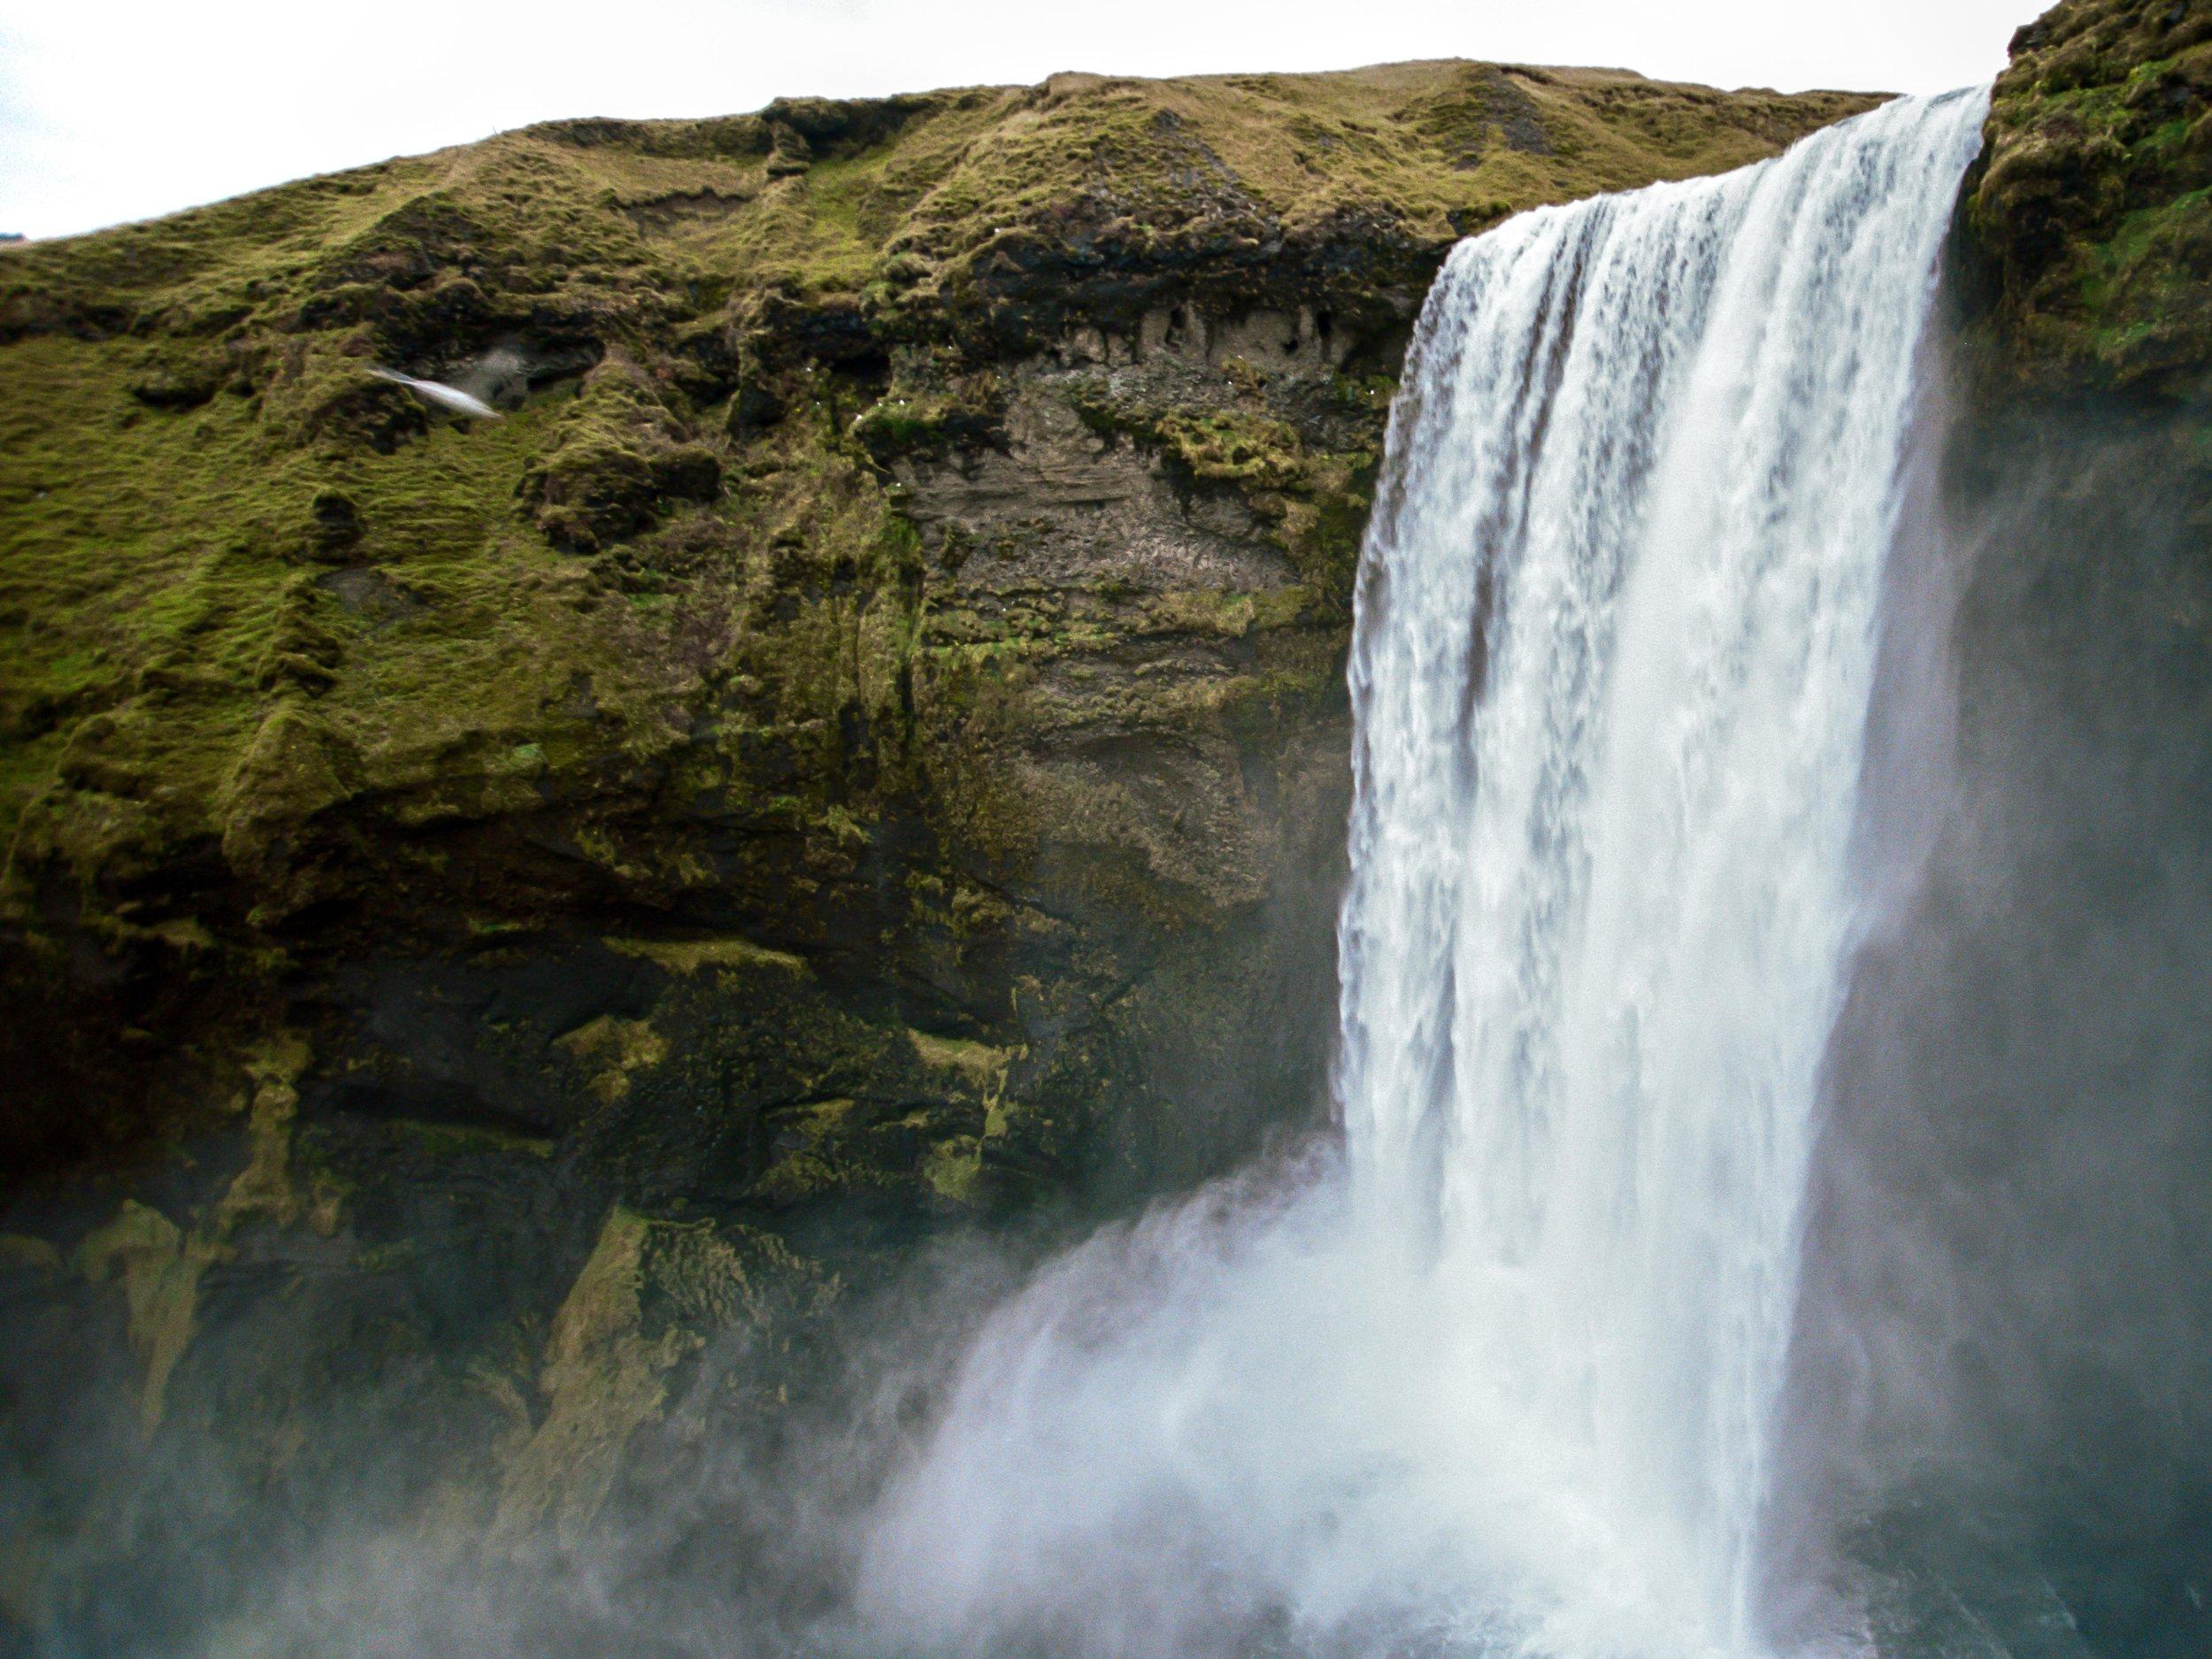 Skógafoss, Iceland 35mm Portra 400